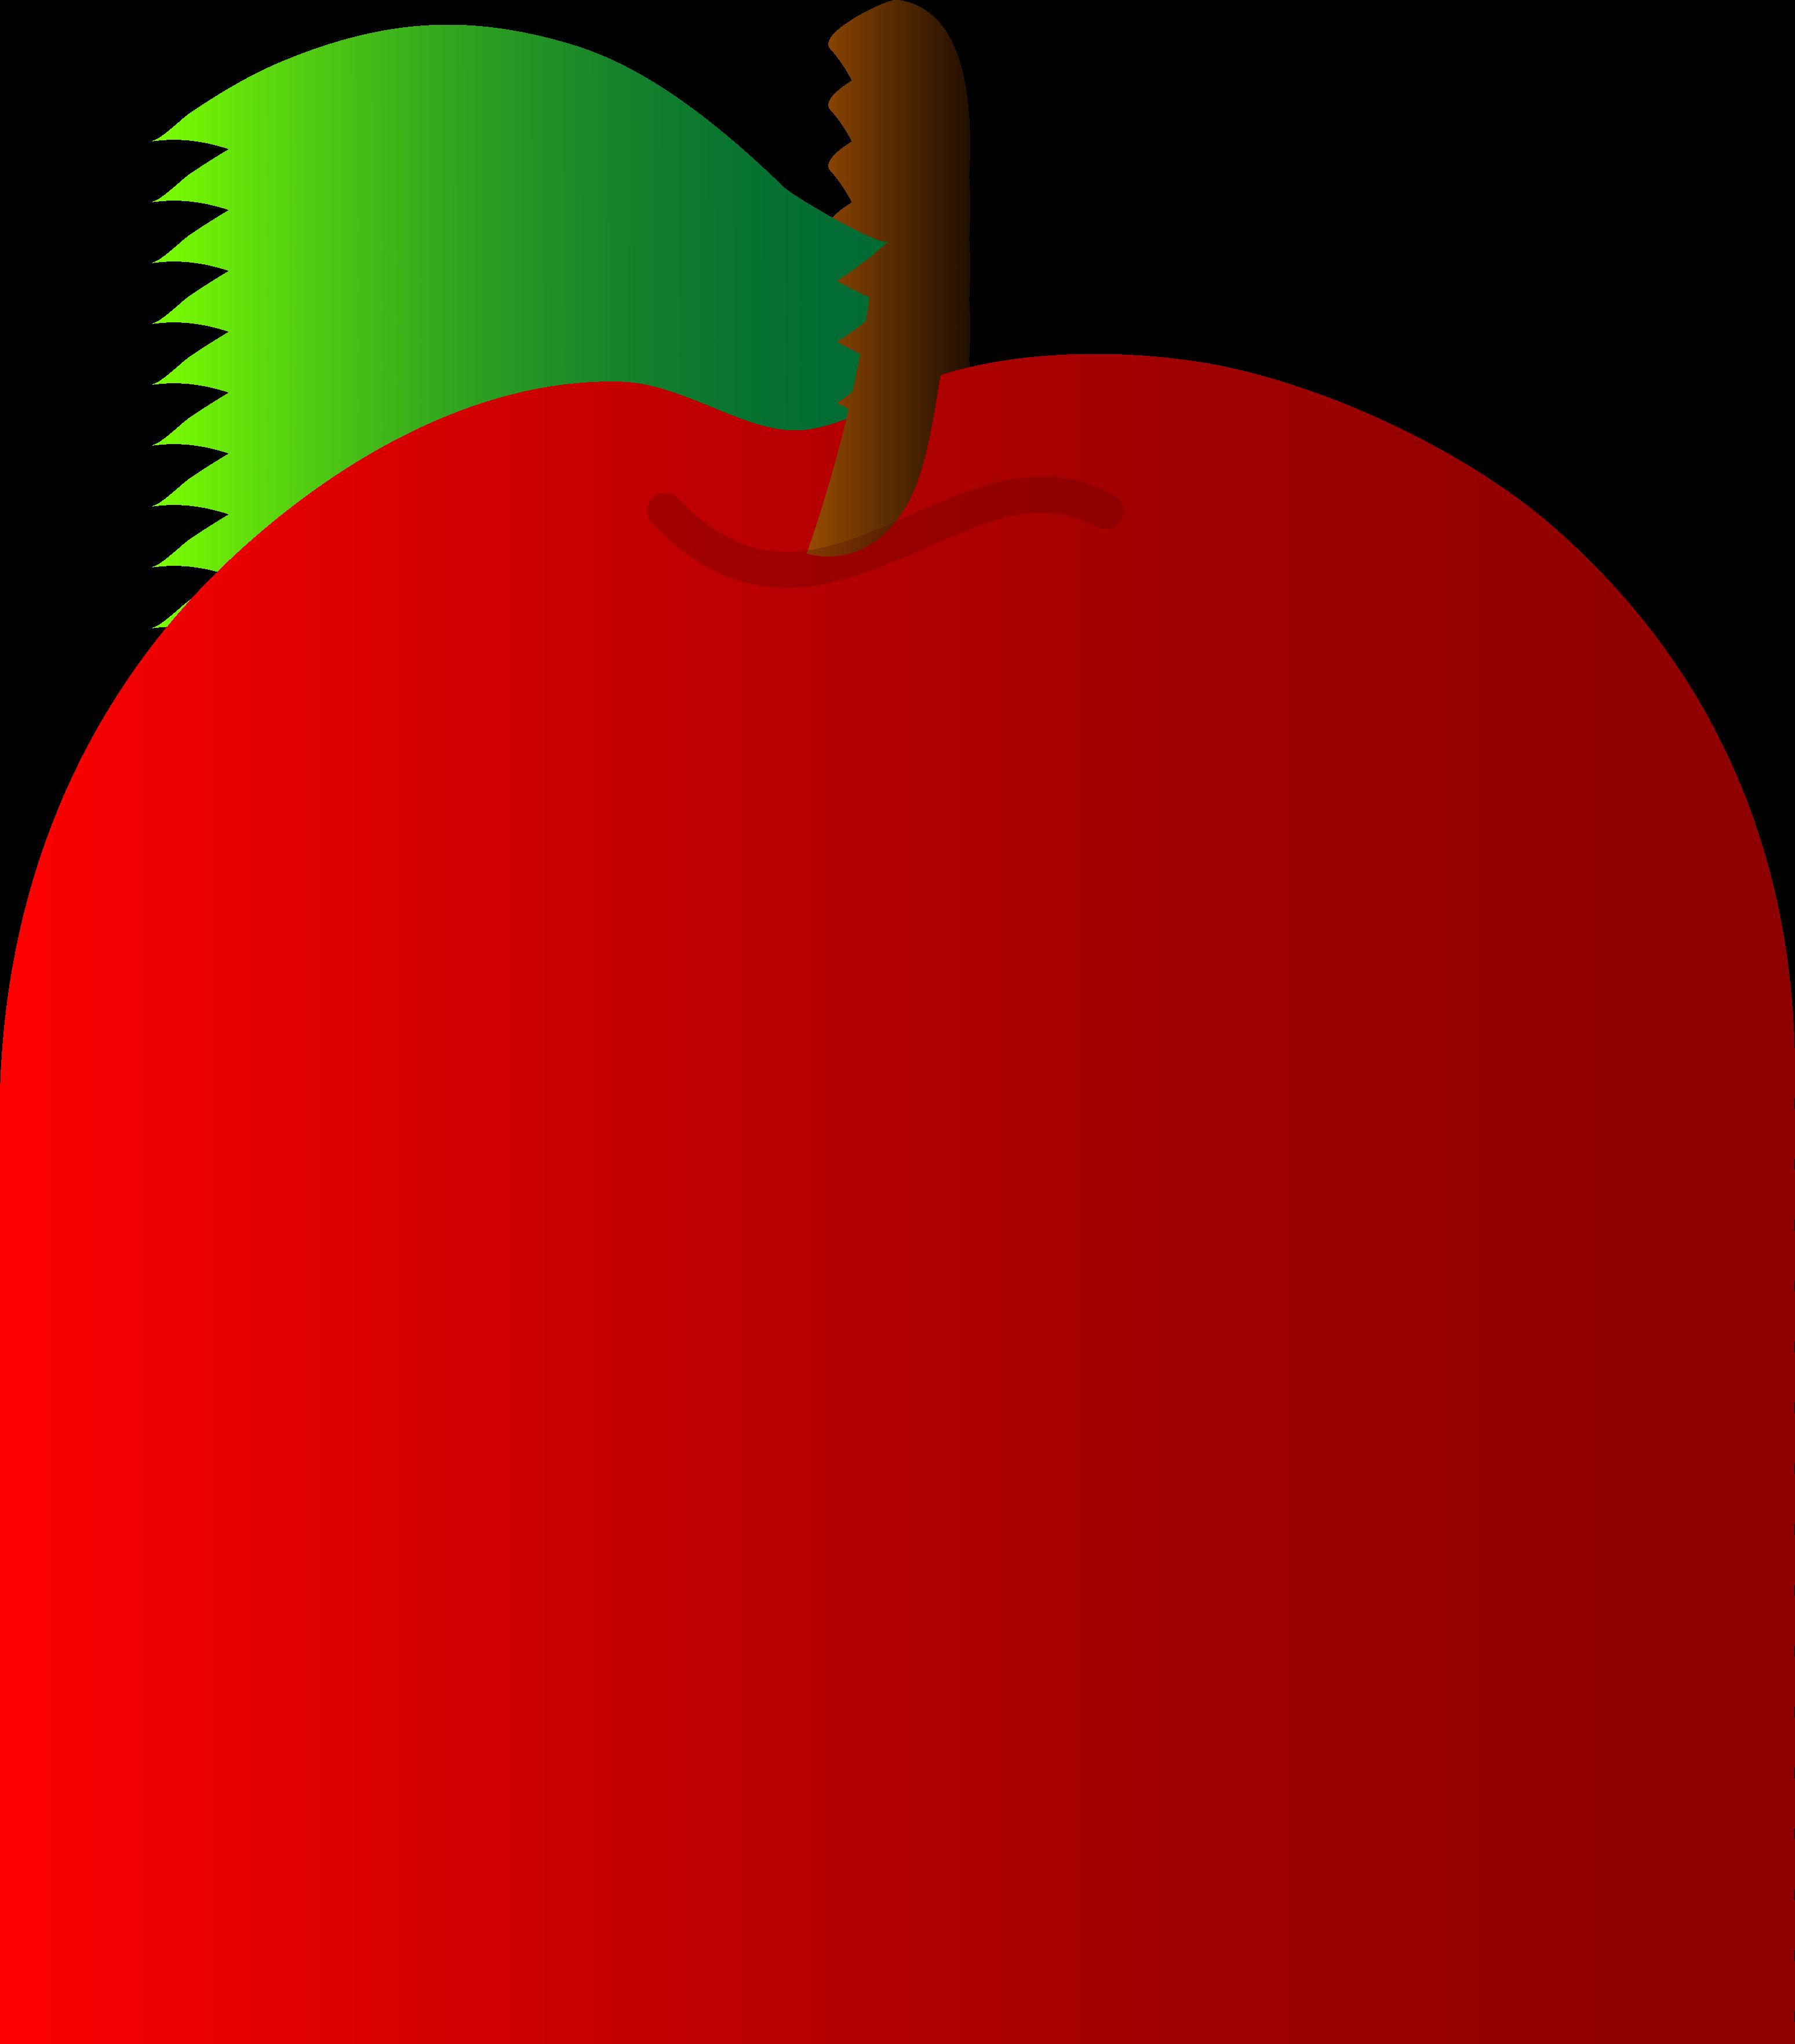 Appl e clipart vector transparent library Free Free Apple Clipart, Download Free Clip Art, Free Clip Art on ... vector transparent library